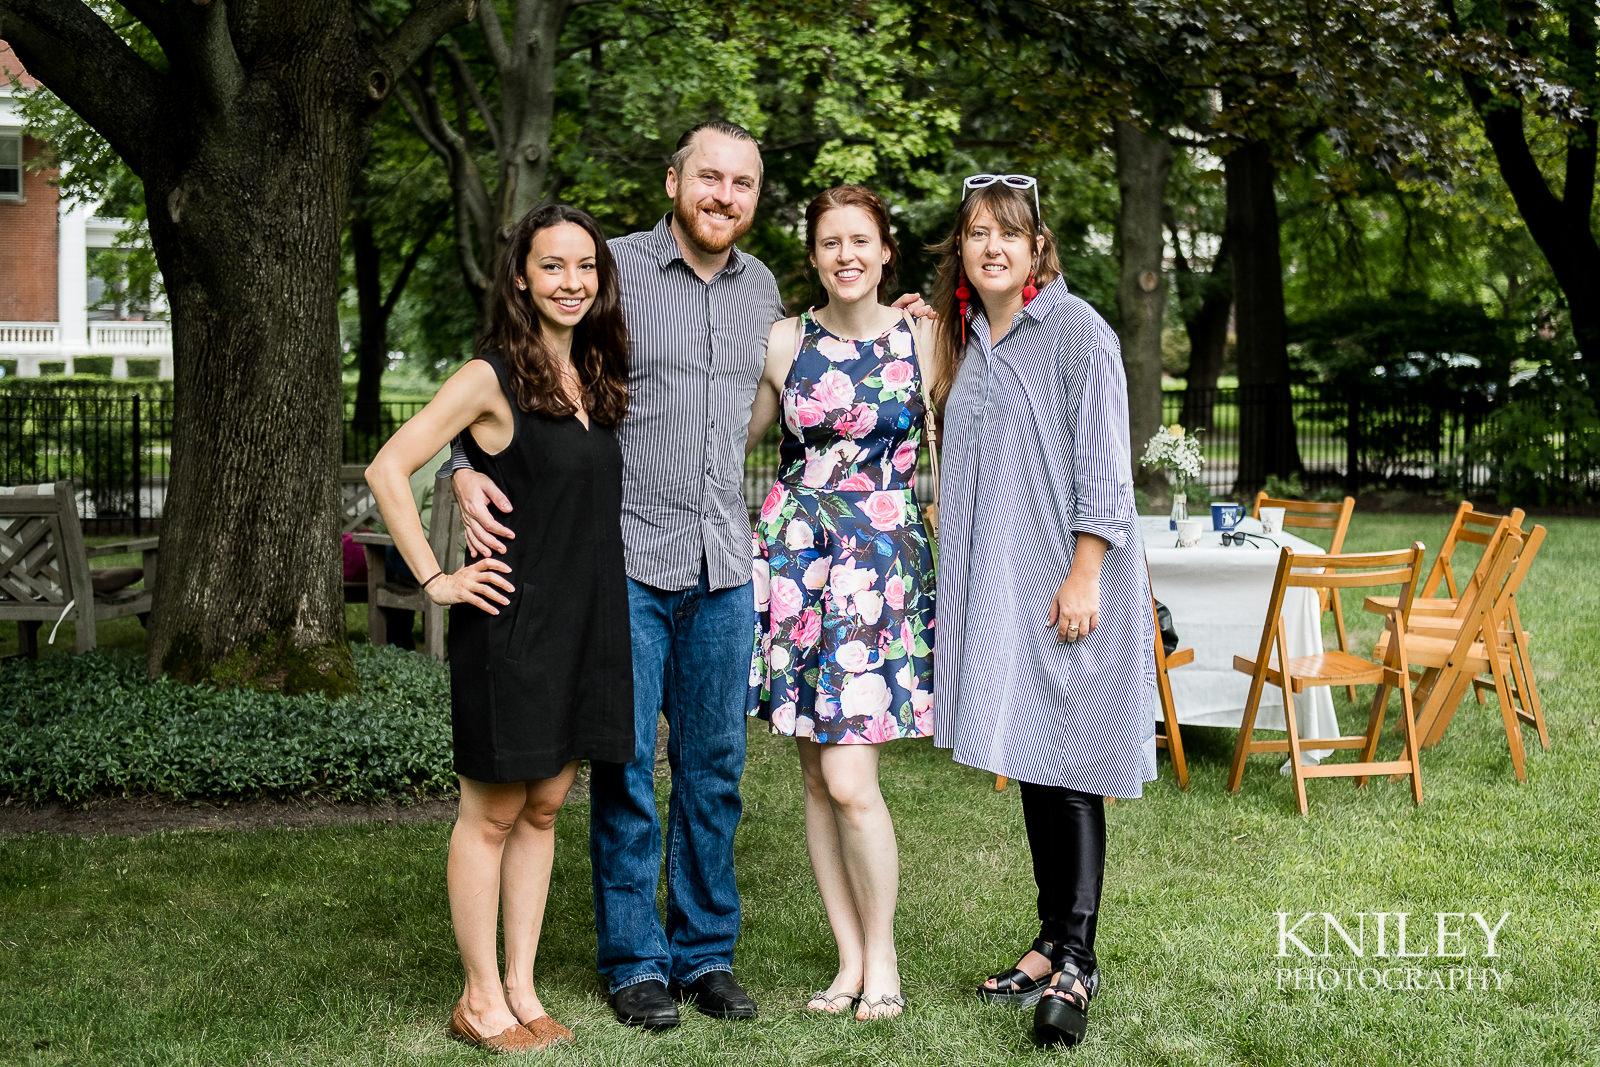 193 - Family brunch after wedding - Rochester NY - XT2A6328.jpg